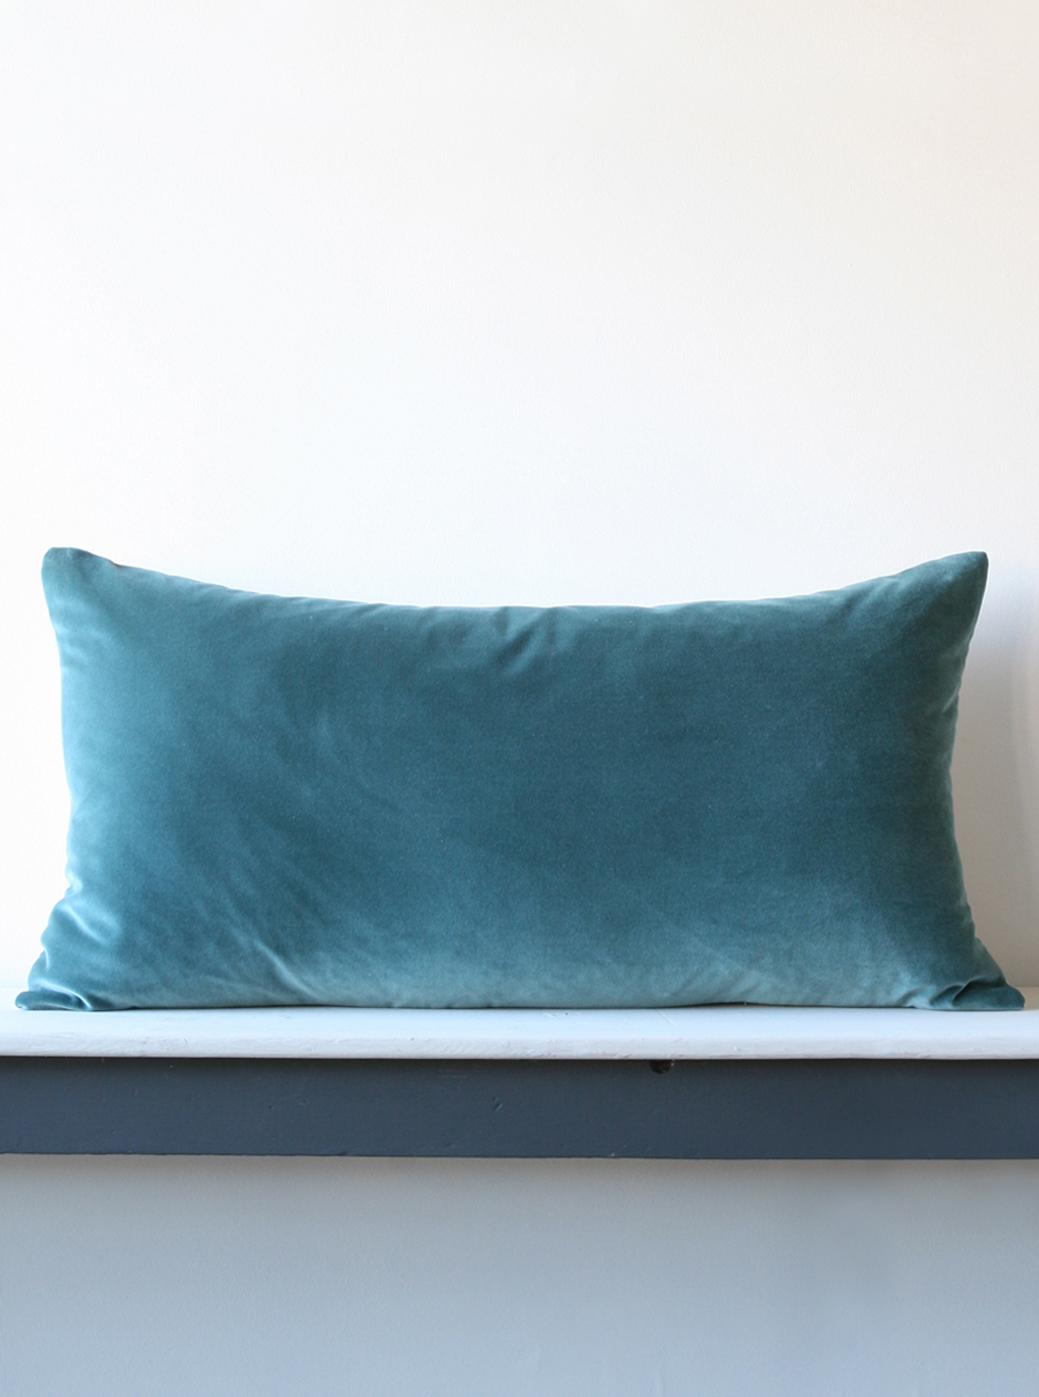 Large Thin Cushion 83cm X 43cm Velvet Unpiped Kate Forman